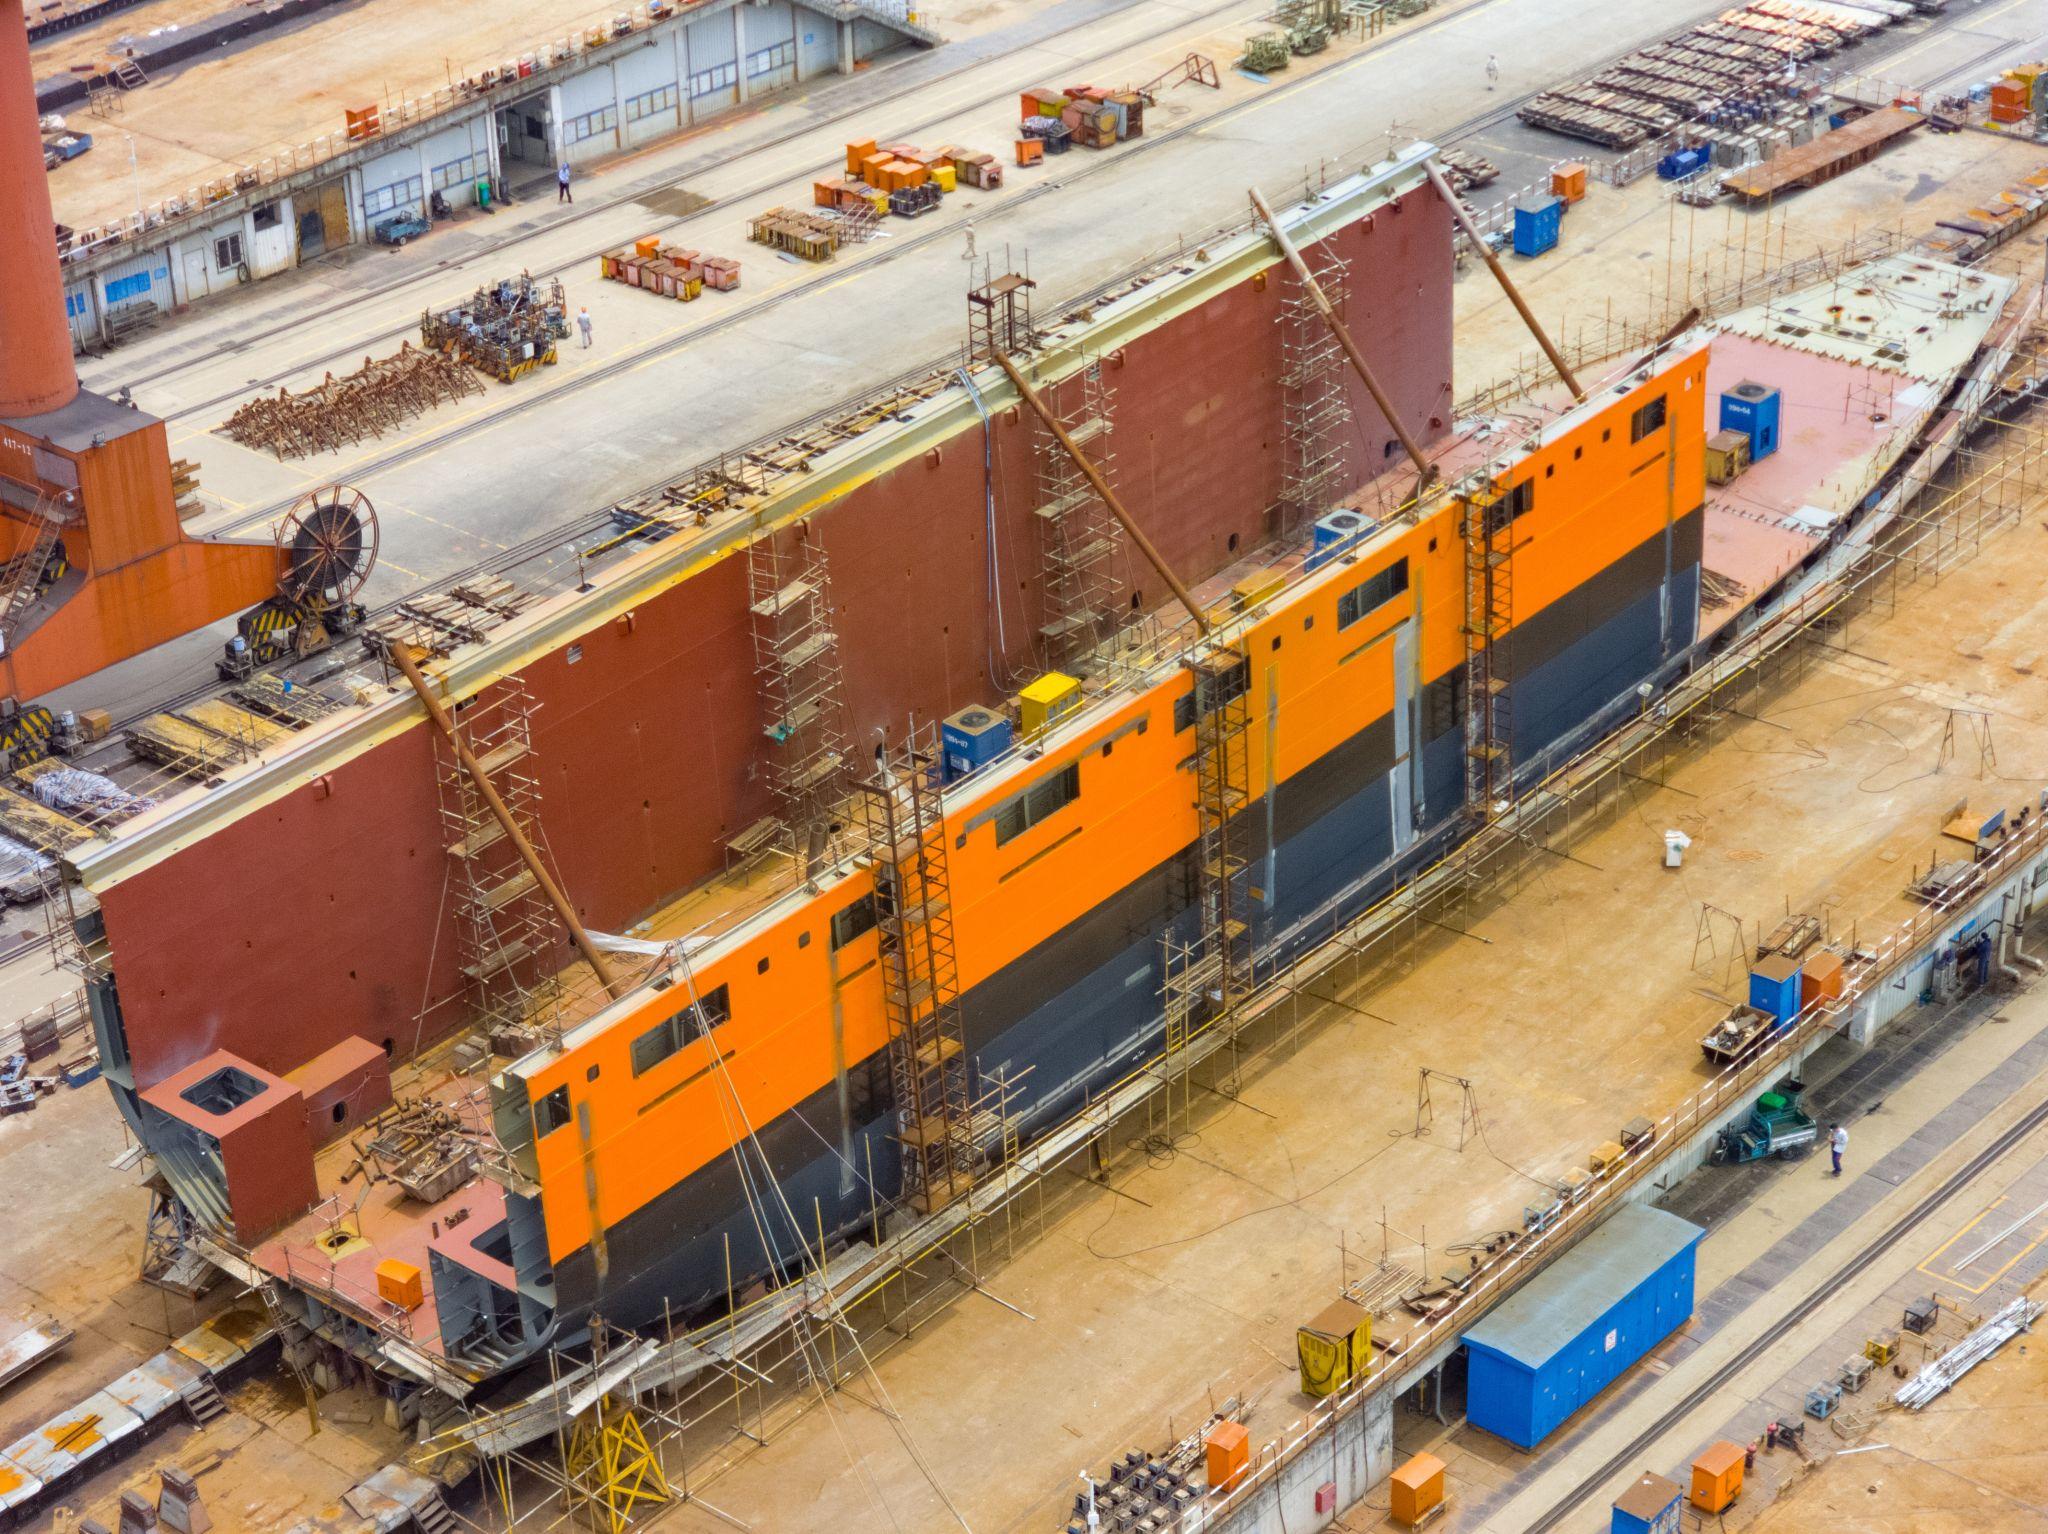 Newbuild Wijnne Barends_Lady_Wuhu Shipyard